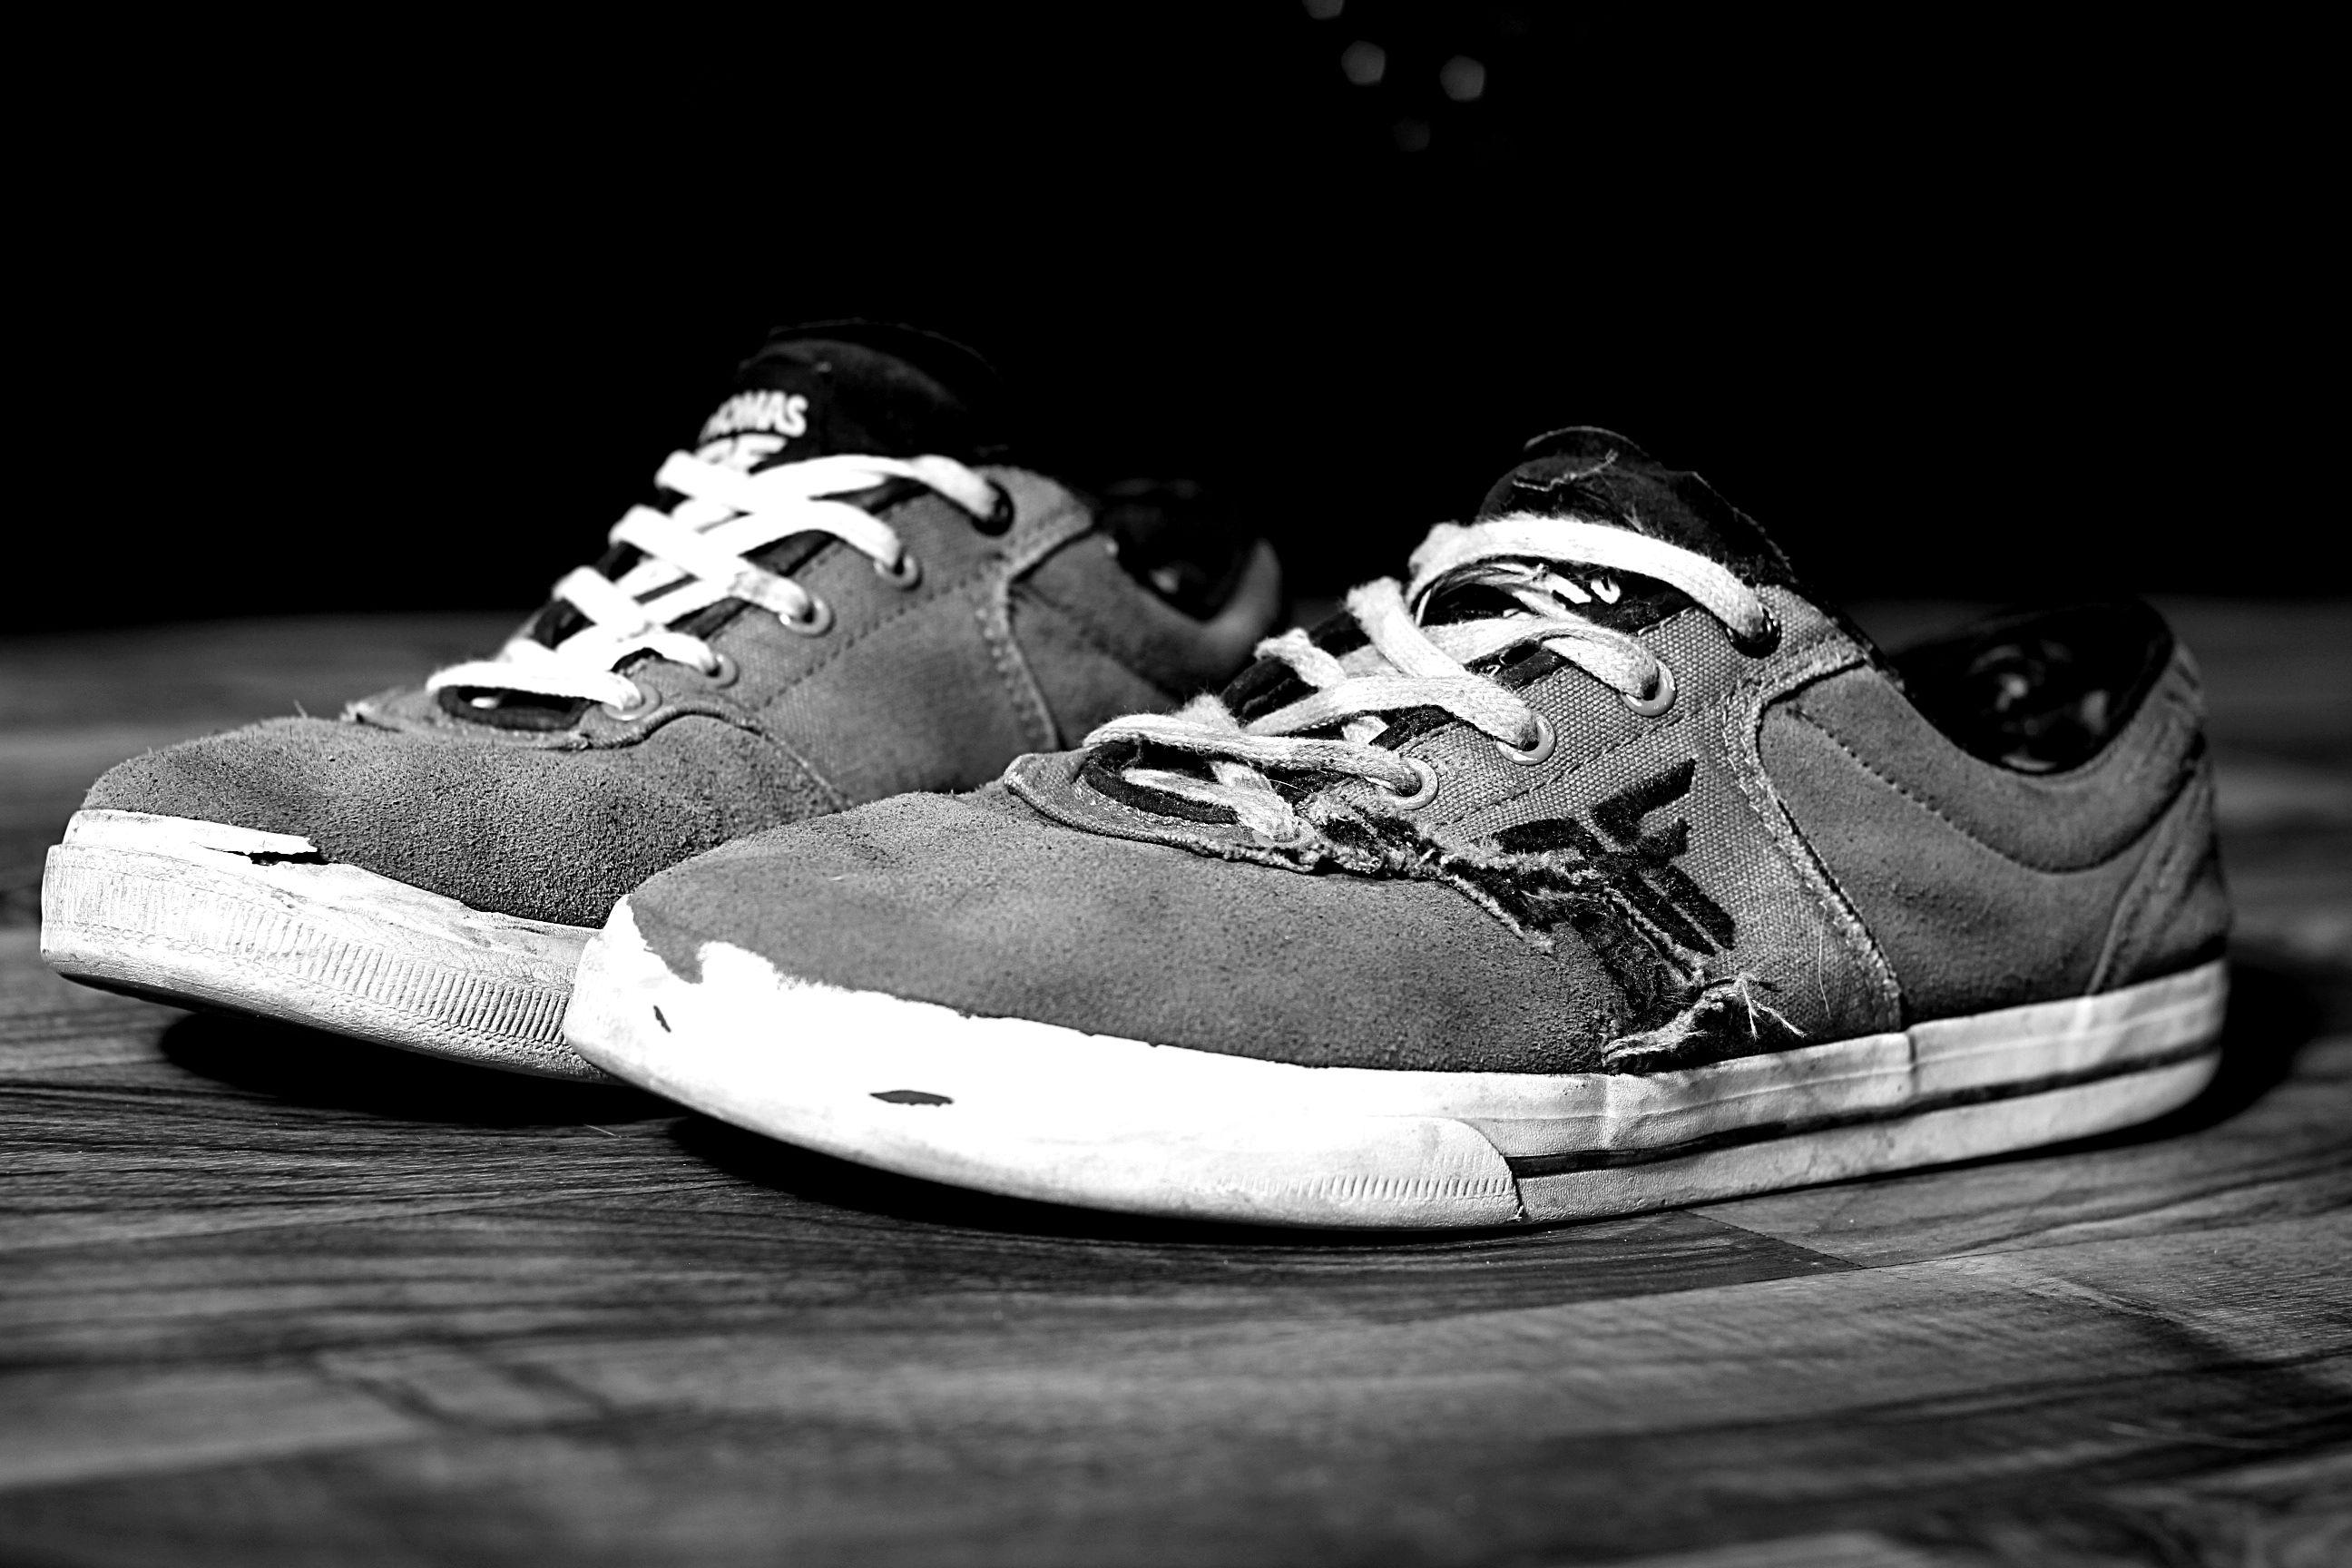 SkateShoe's